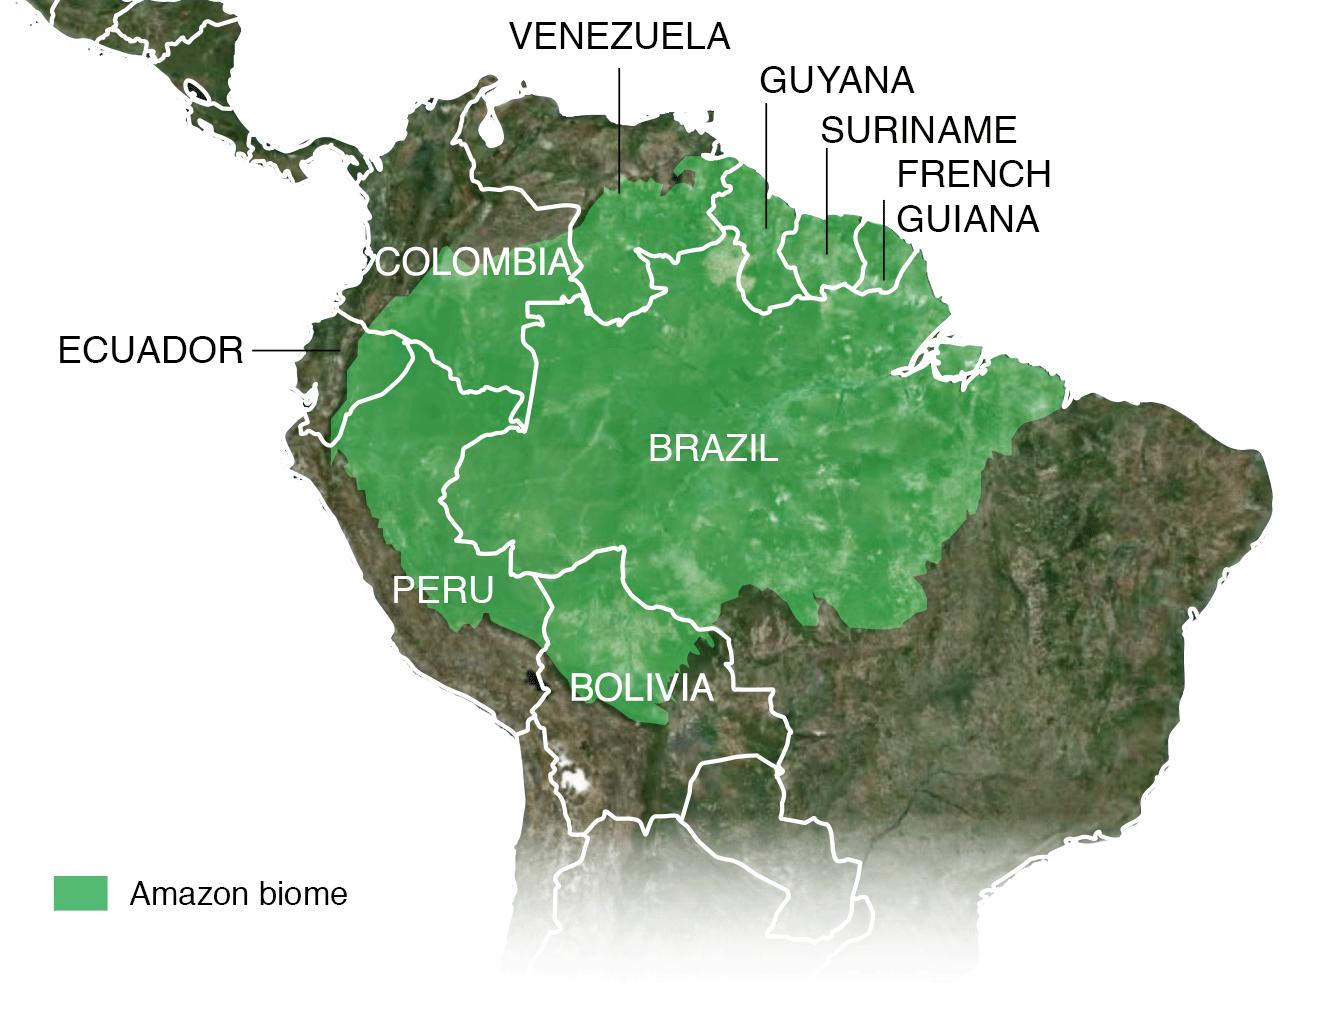 Map of Amazon biome including Peru, Bolivia, Ecuador, Colombia, Guyana, Suriname, French Guiana and Brazil and Venezuela